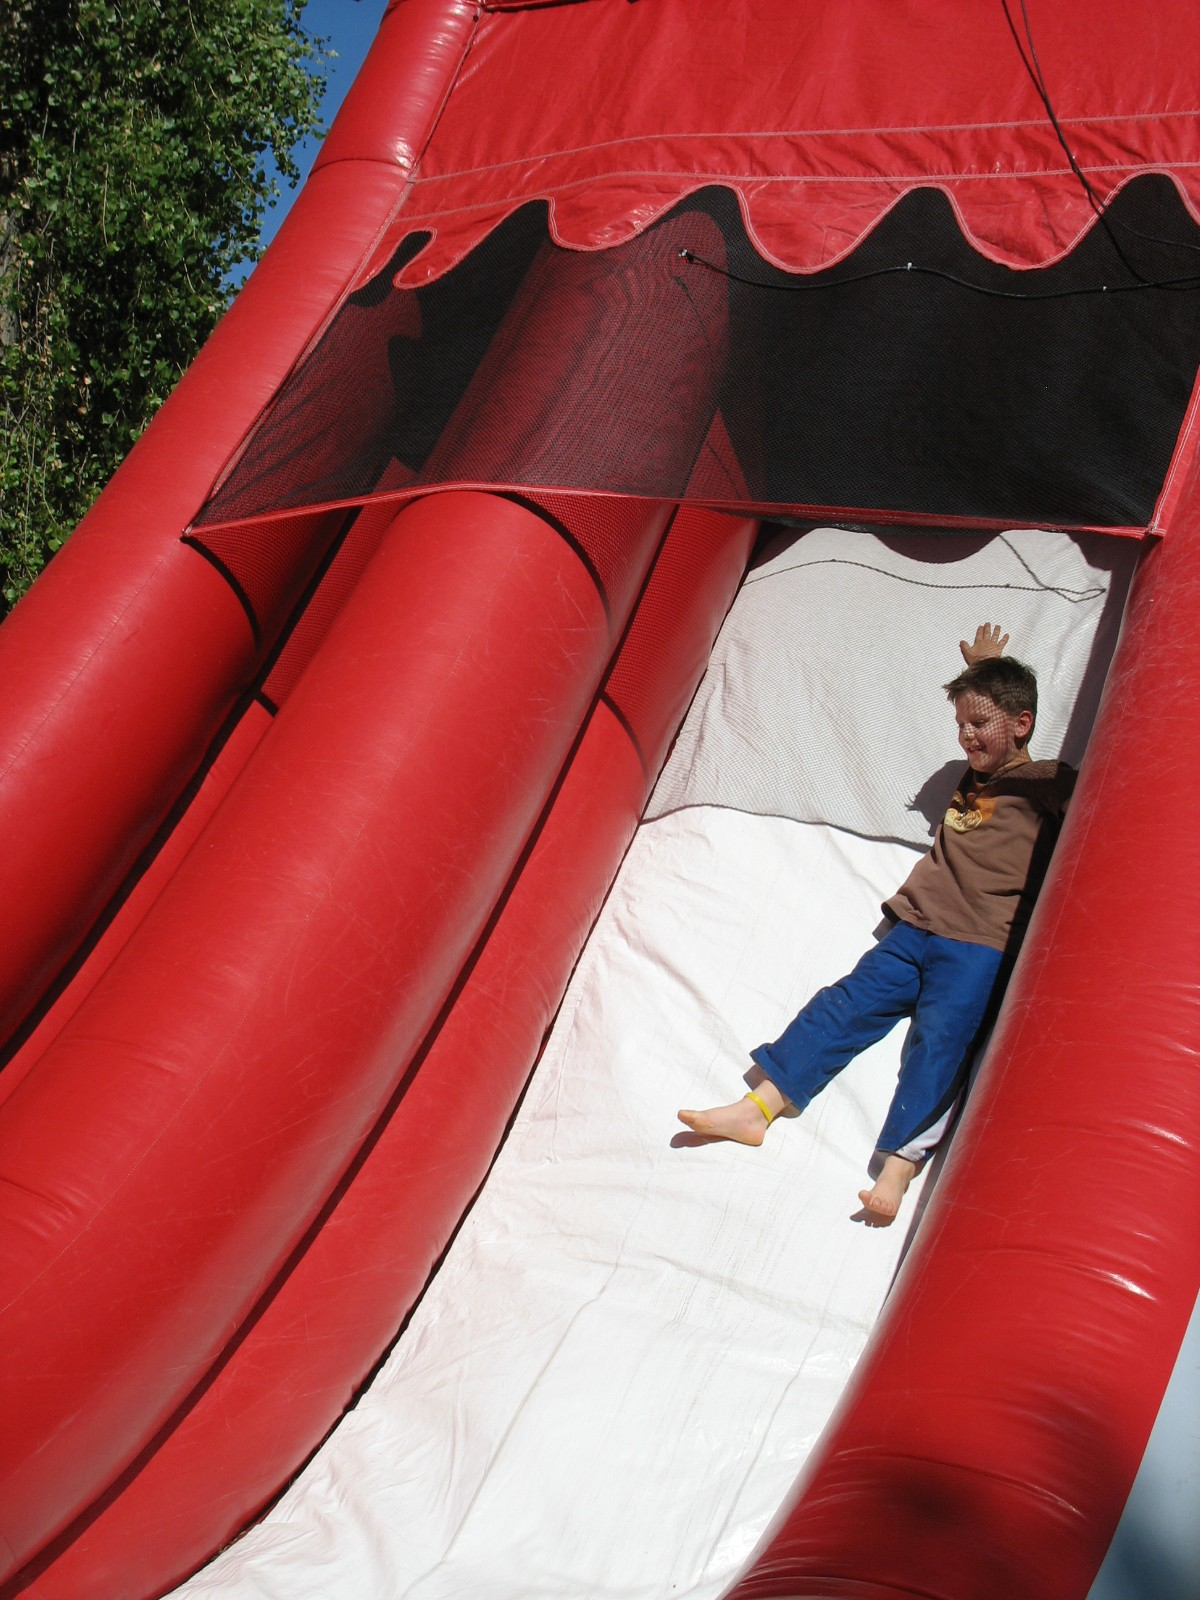 slides are always good